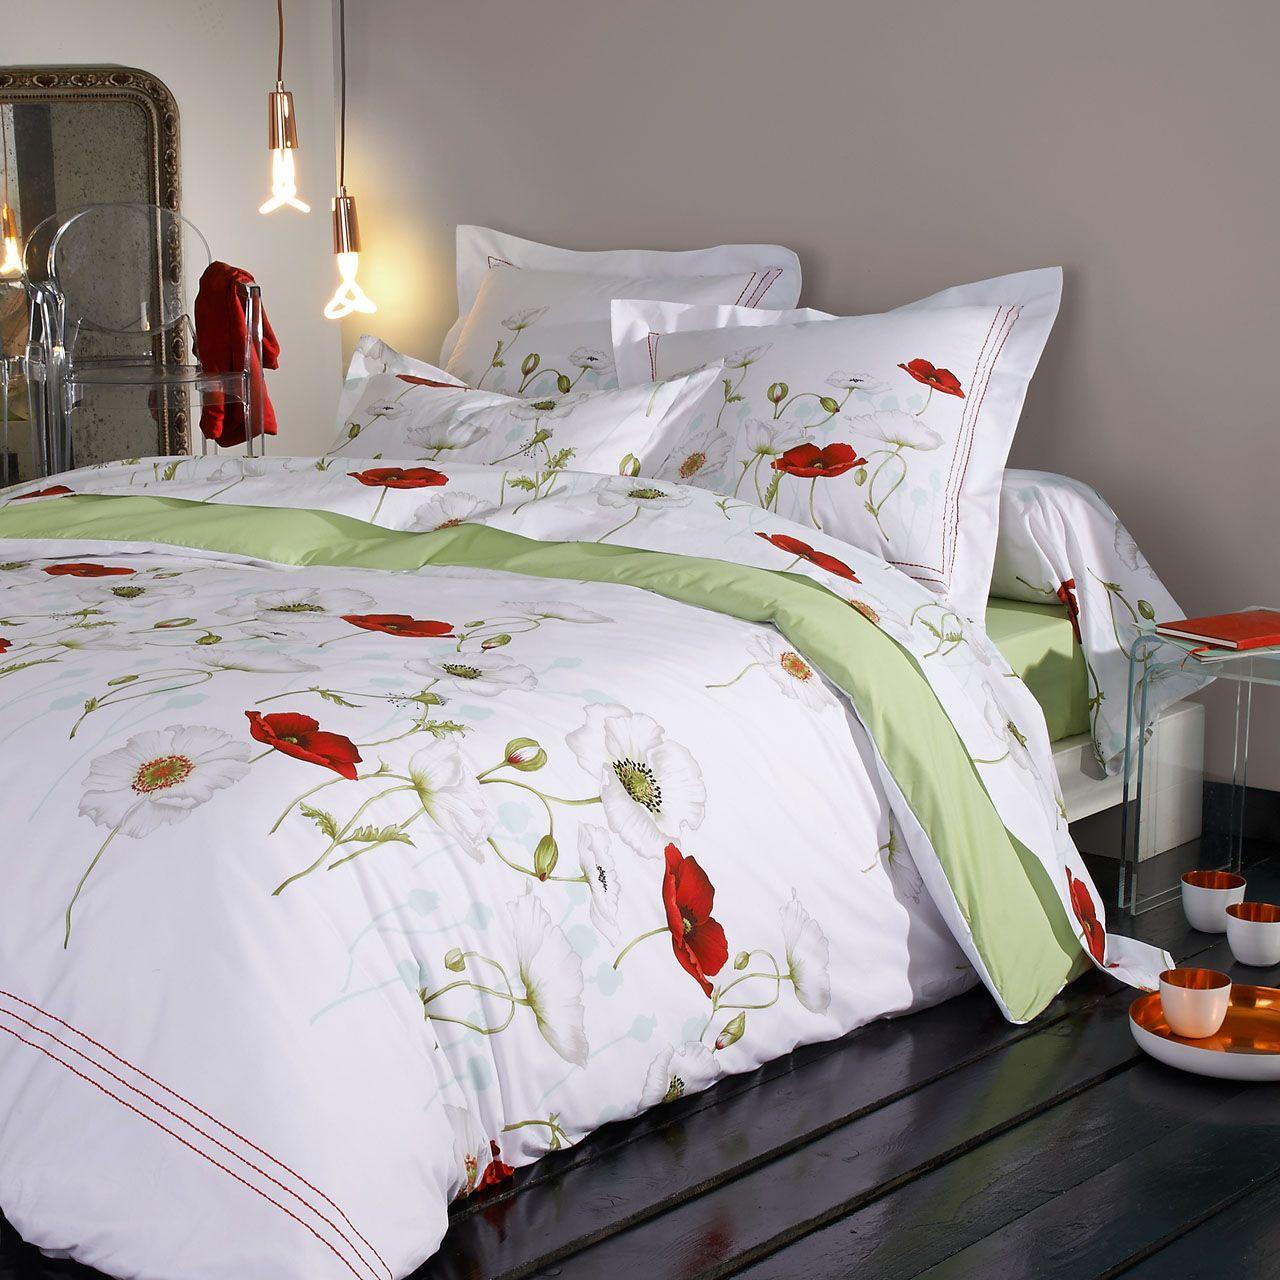 drap housse percale s duction 160x200 tradilinge. Black Bedroom Furniture Sets. Home Design Ideas